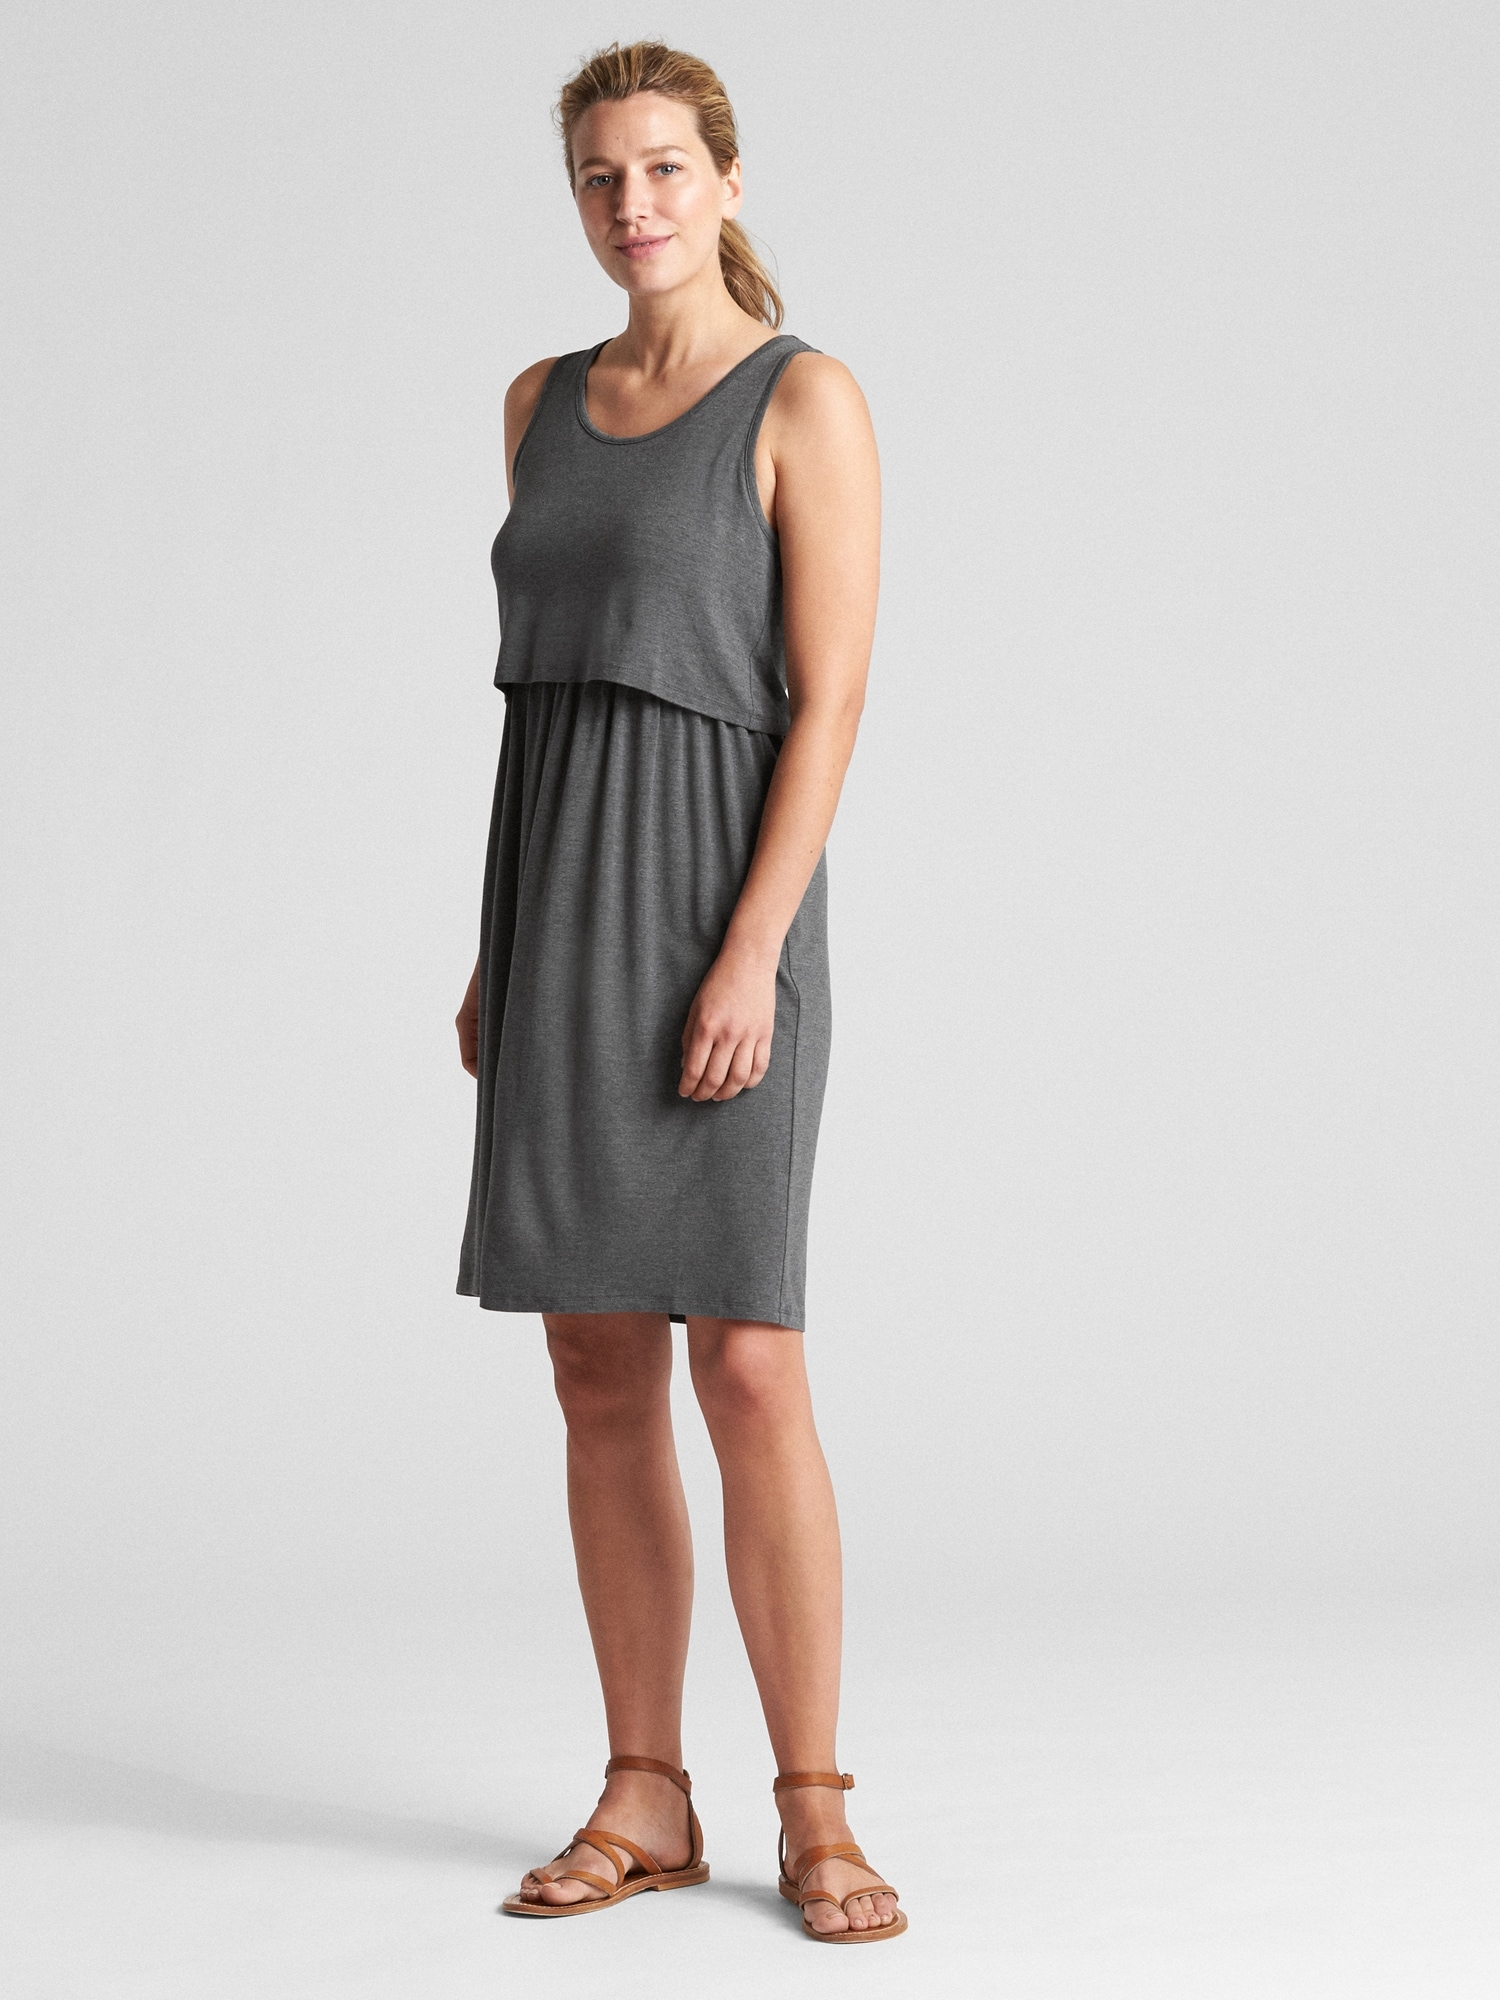 85d20202defa6 Maternity Layered Nursing Dress